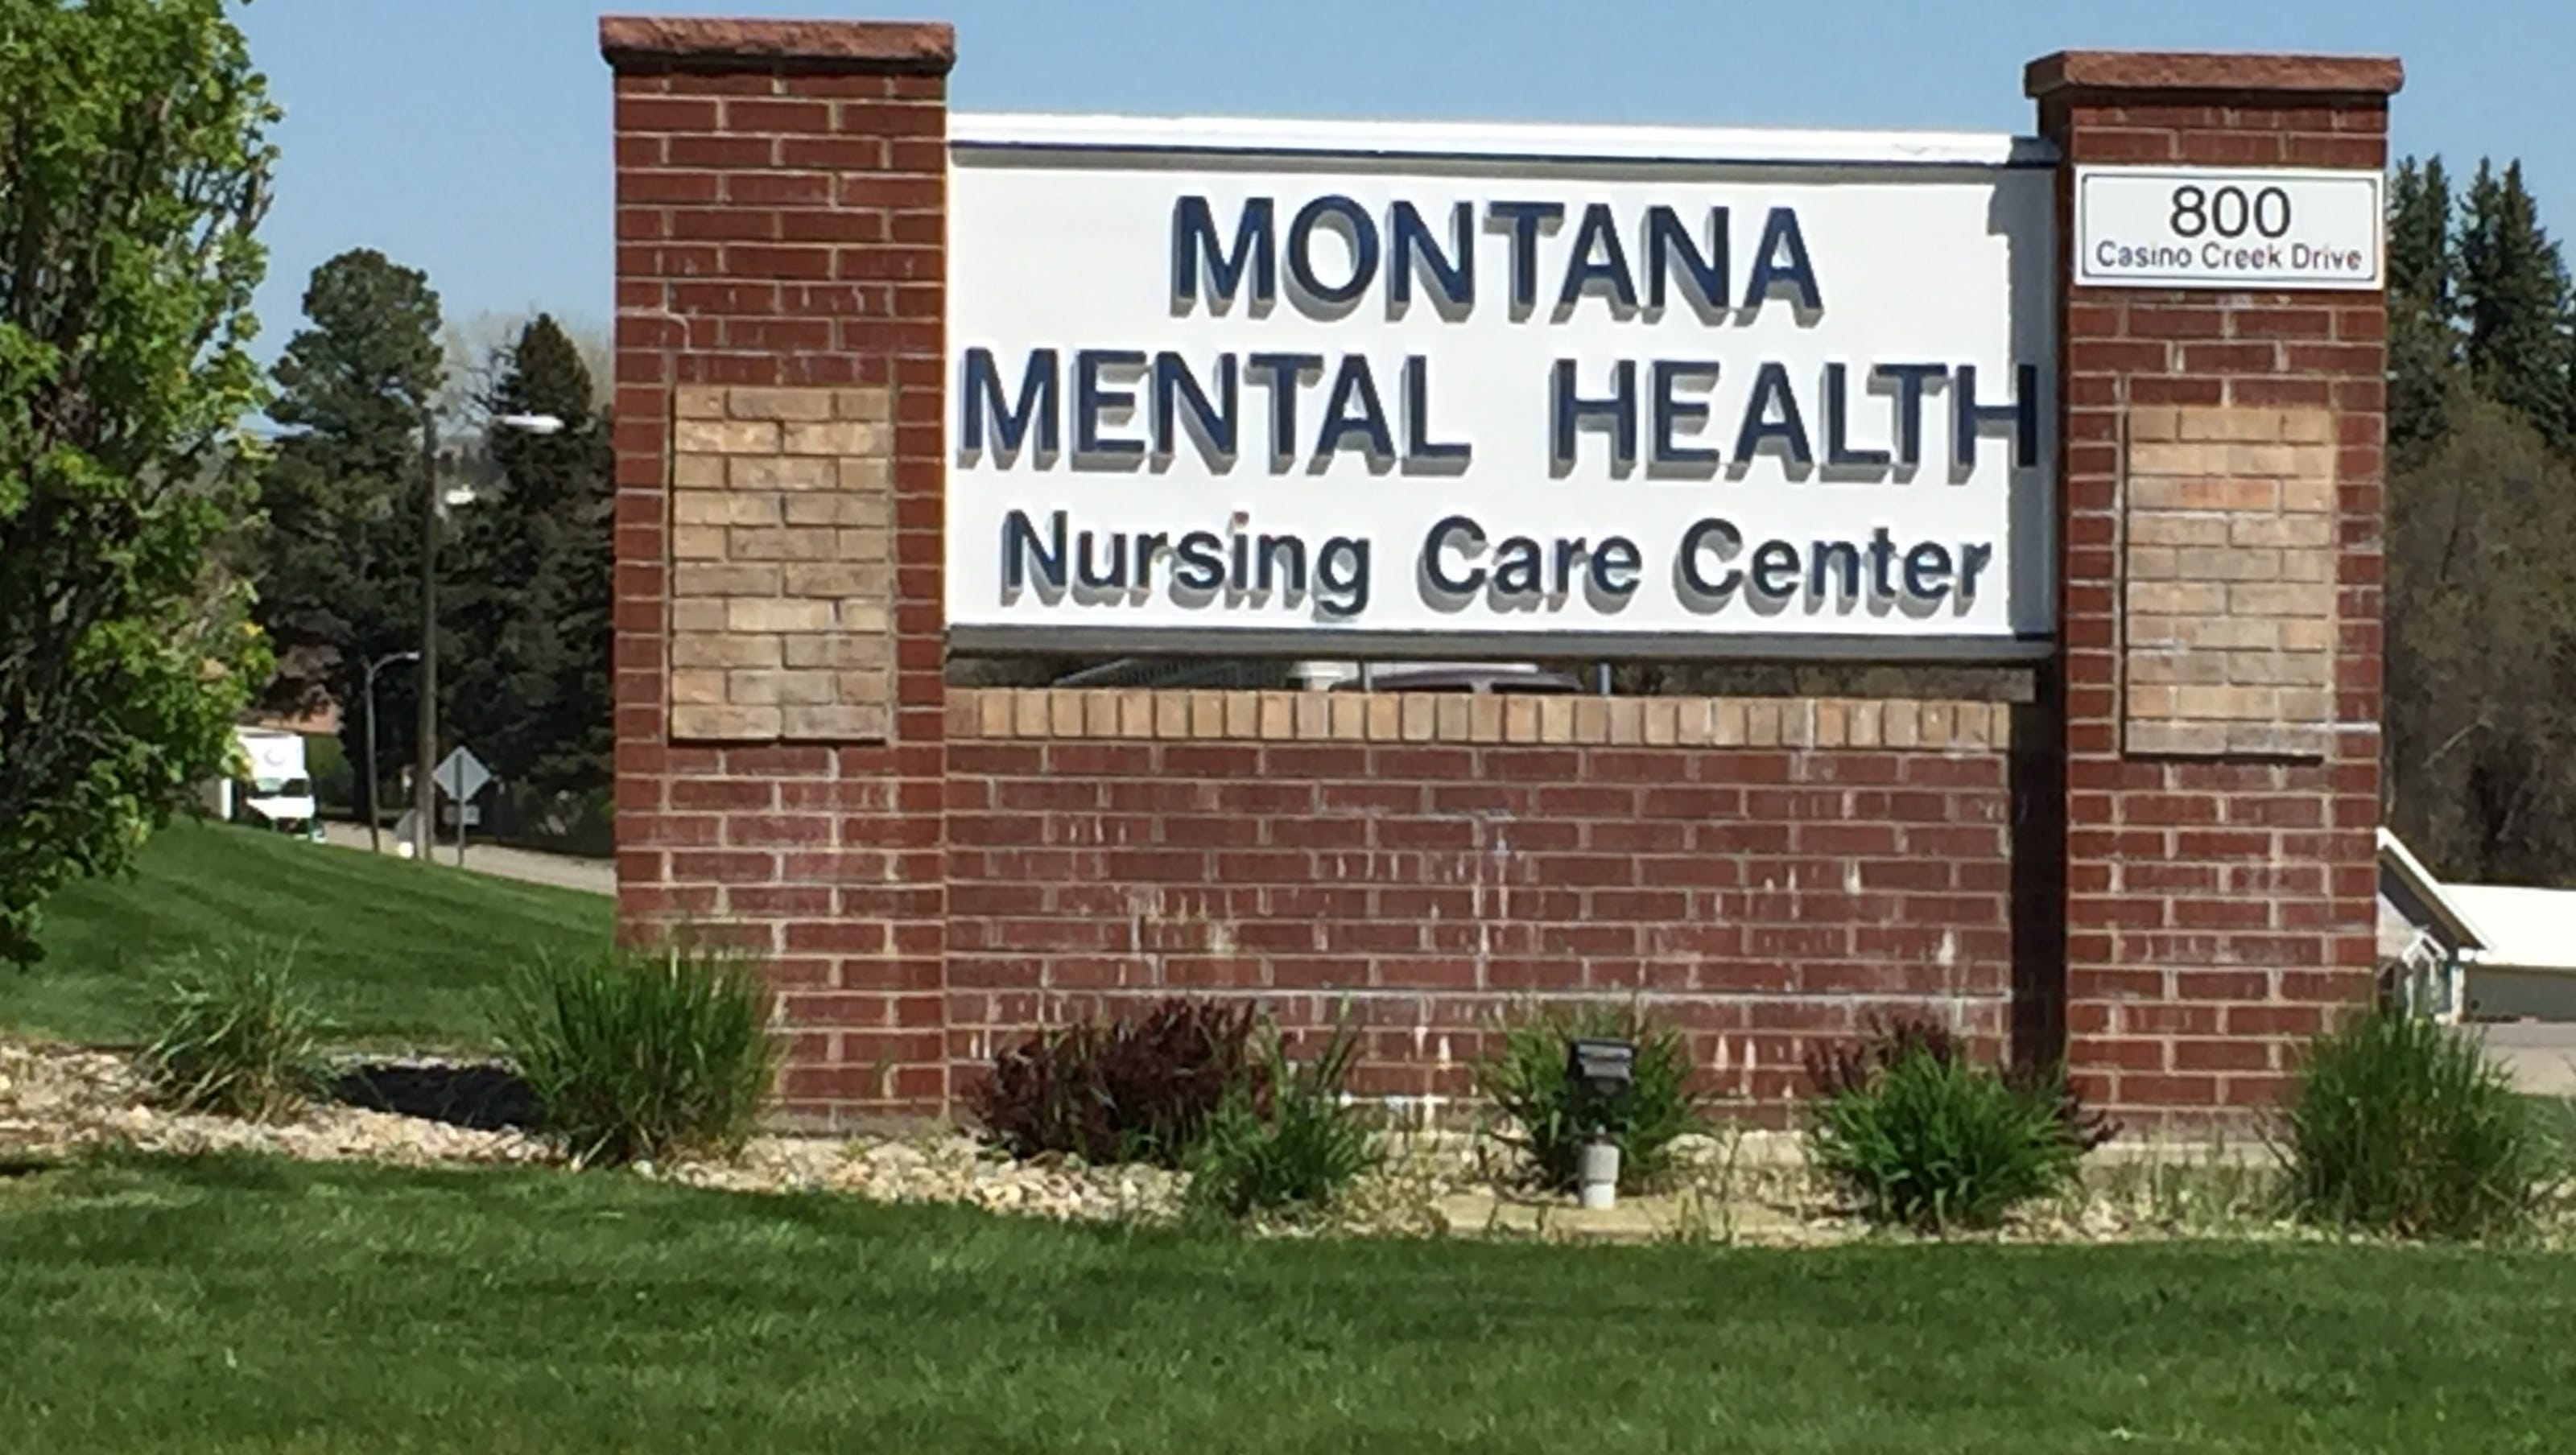 Montana Mental Health Nursing Care Center Rated Below Average